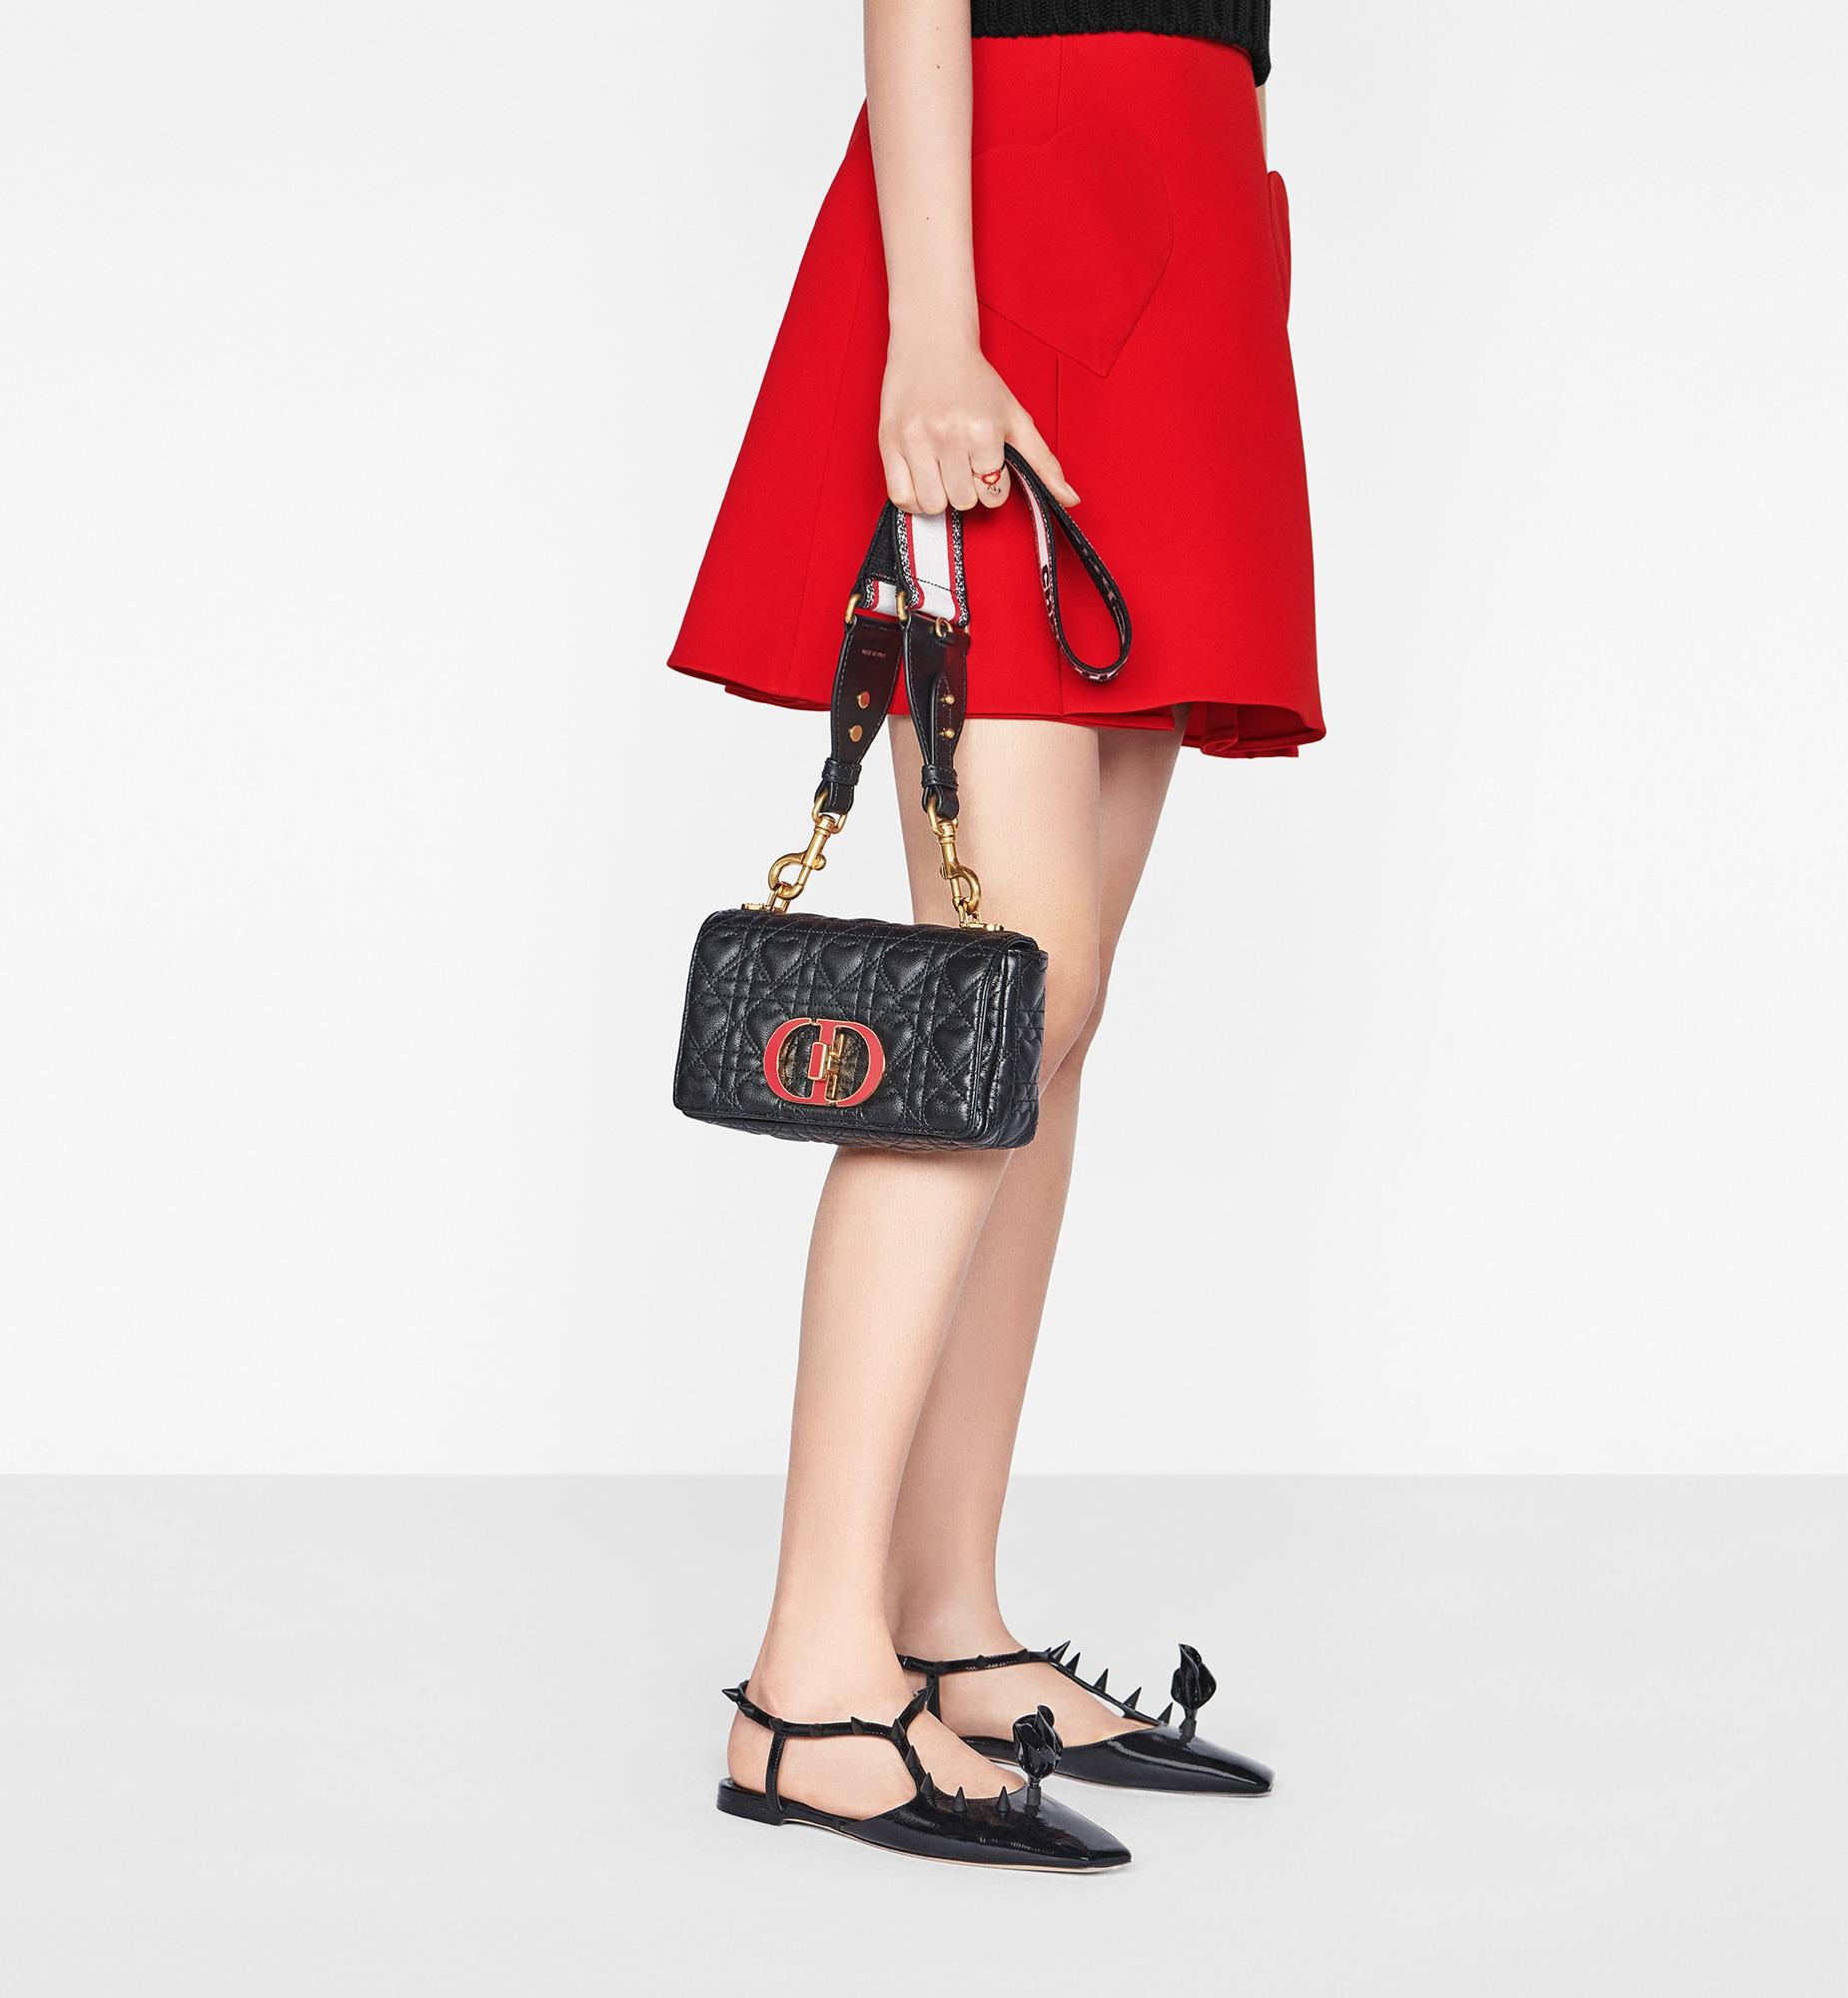 Medium Dioramour Dior Caro Bag Worn view Open gallery